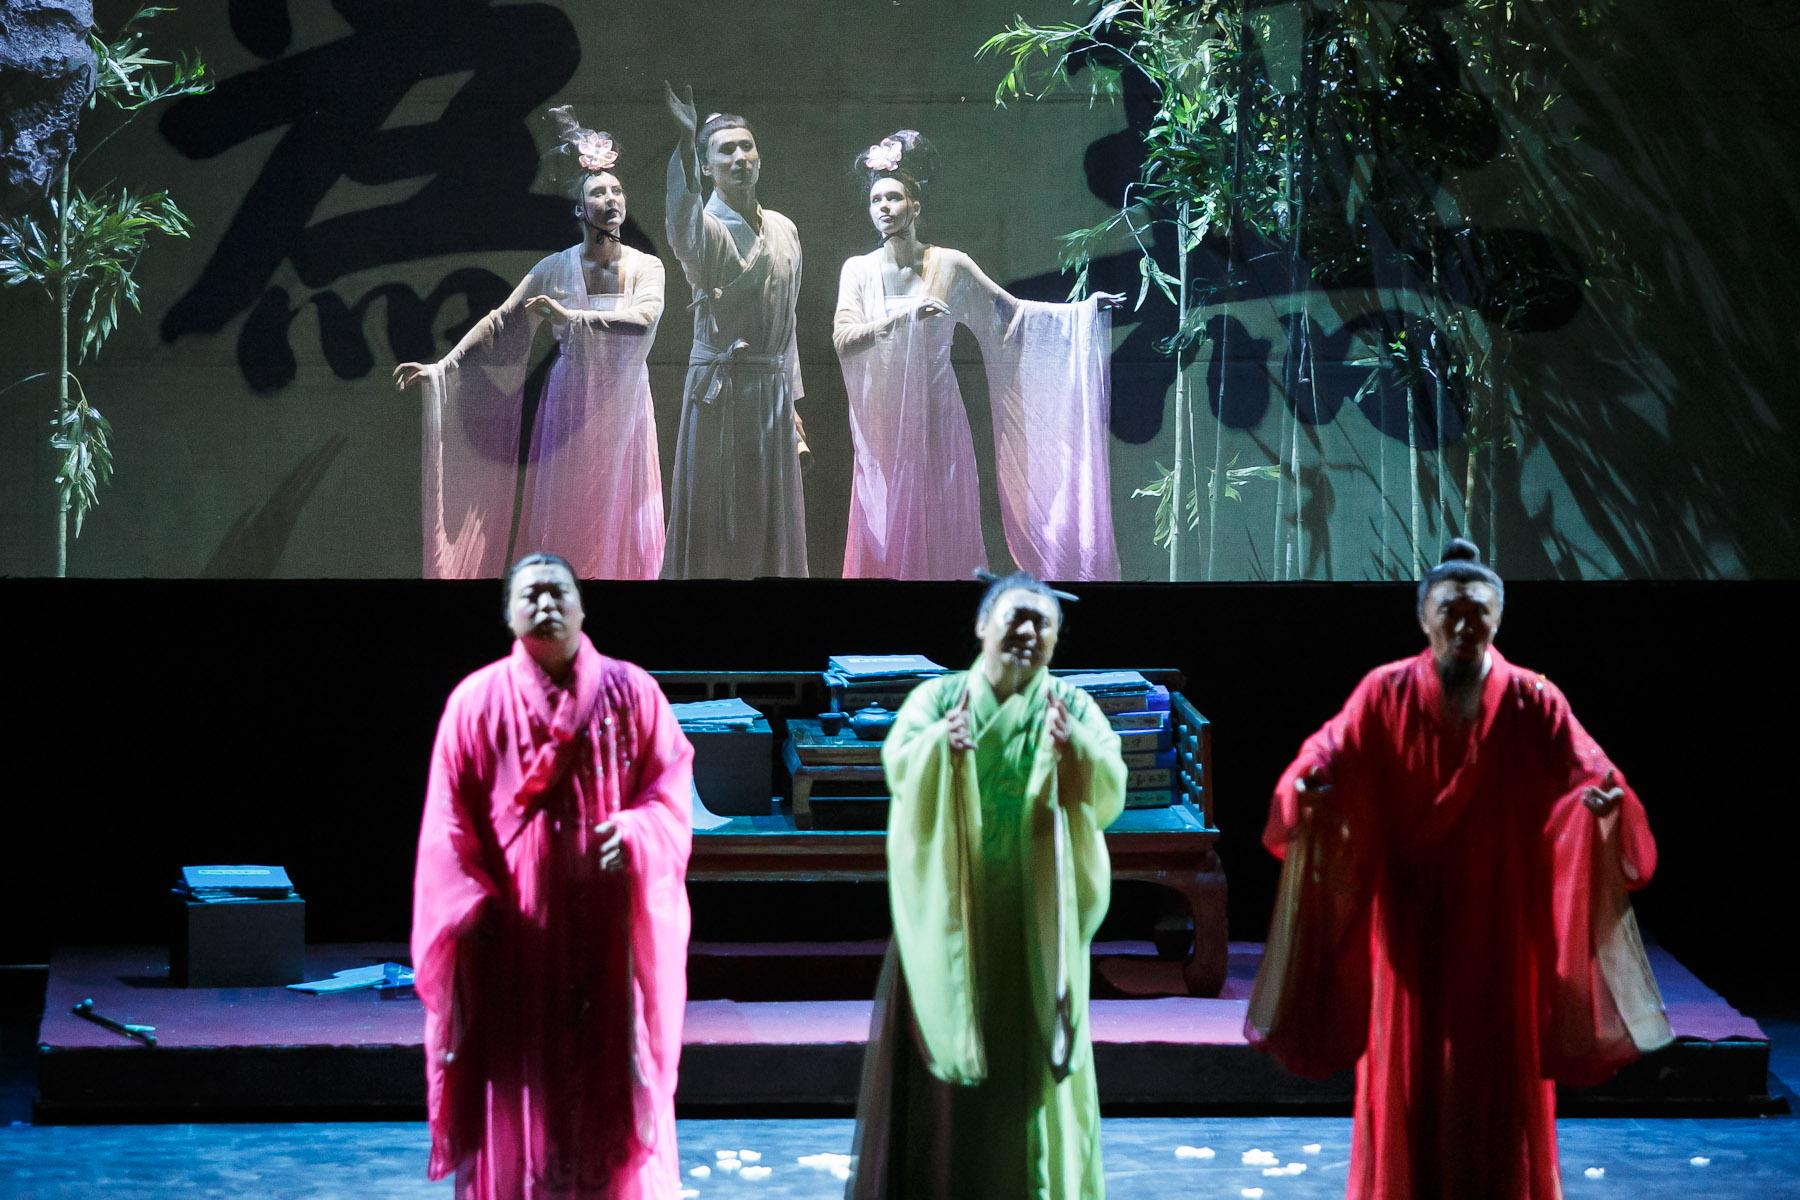 A scene from China National Opera House production of Turandot in Cankarjev dom Cultural & Congress center in Ljubljana, Slovenia, Sep. 1, 2015.